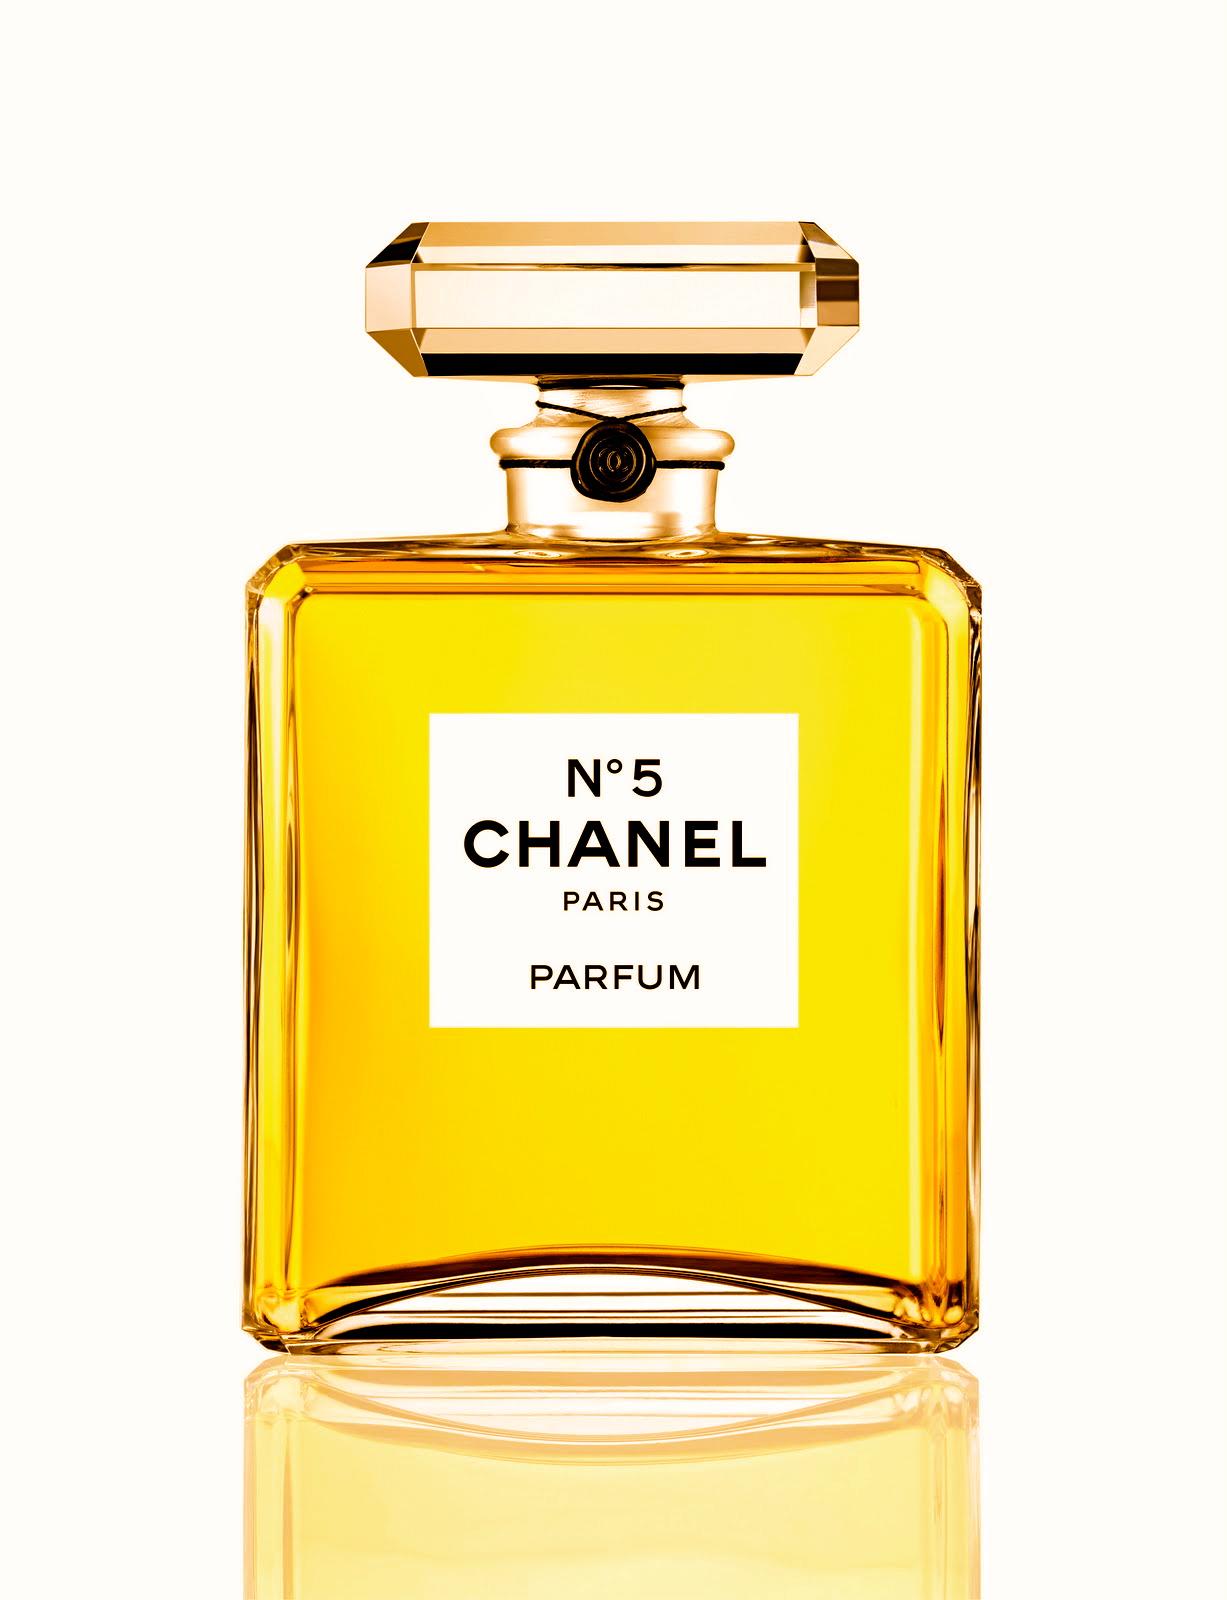 chanel-no5-coco-chanel-bottle